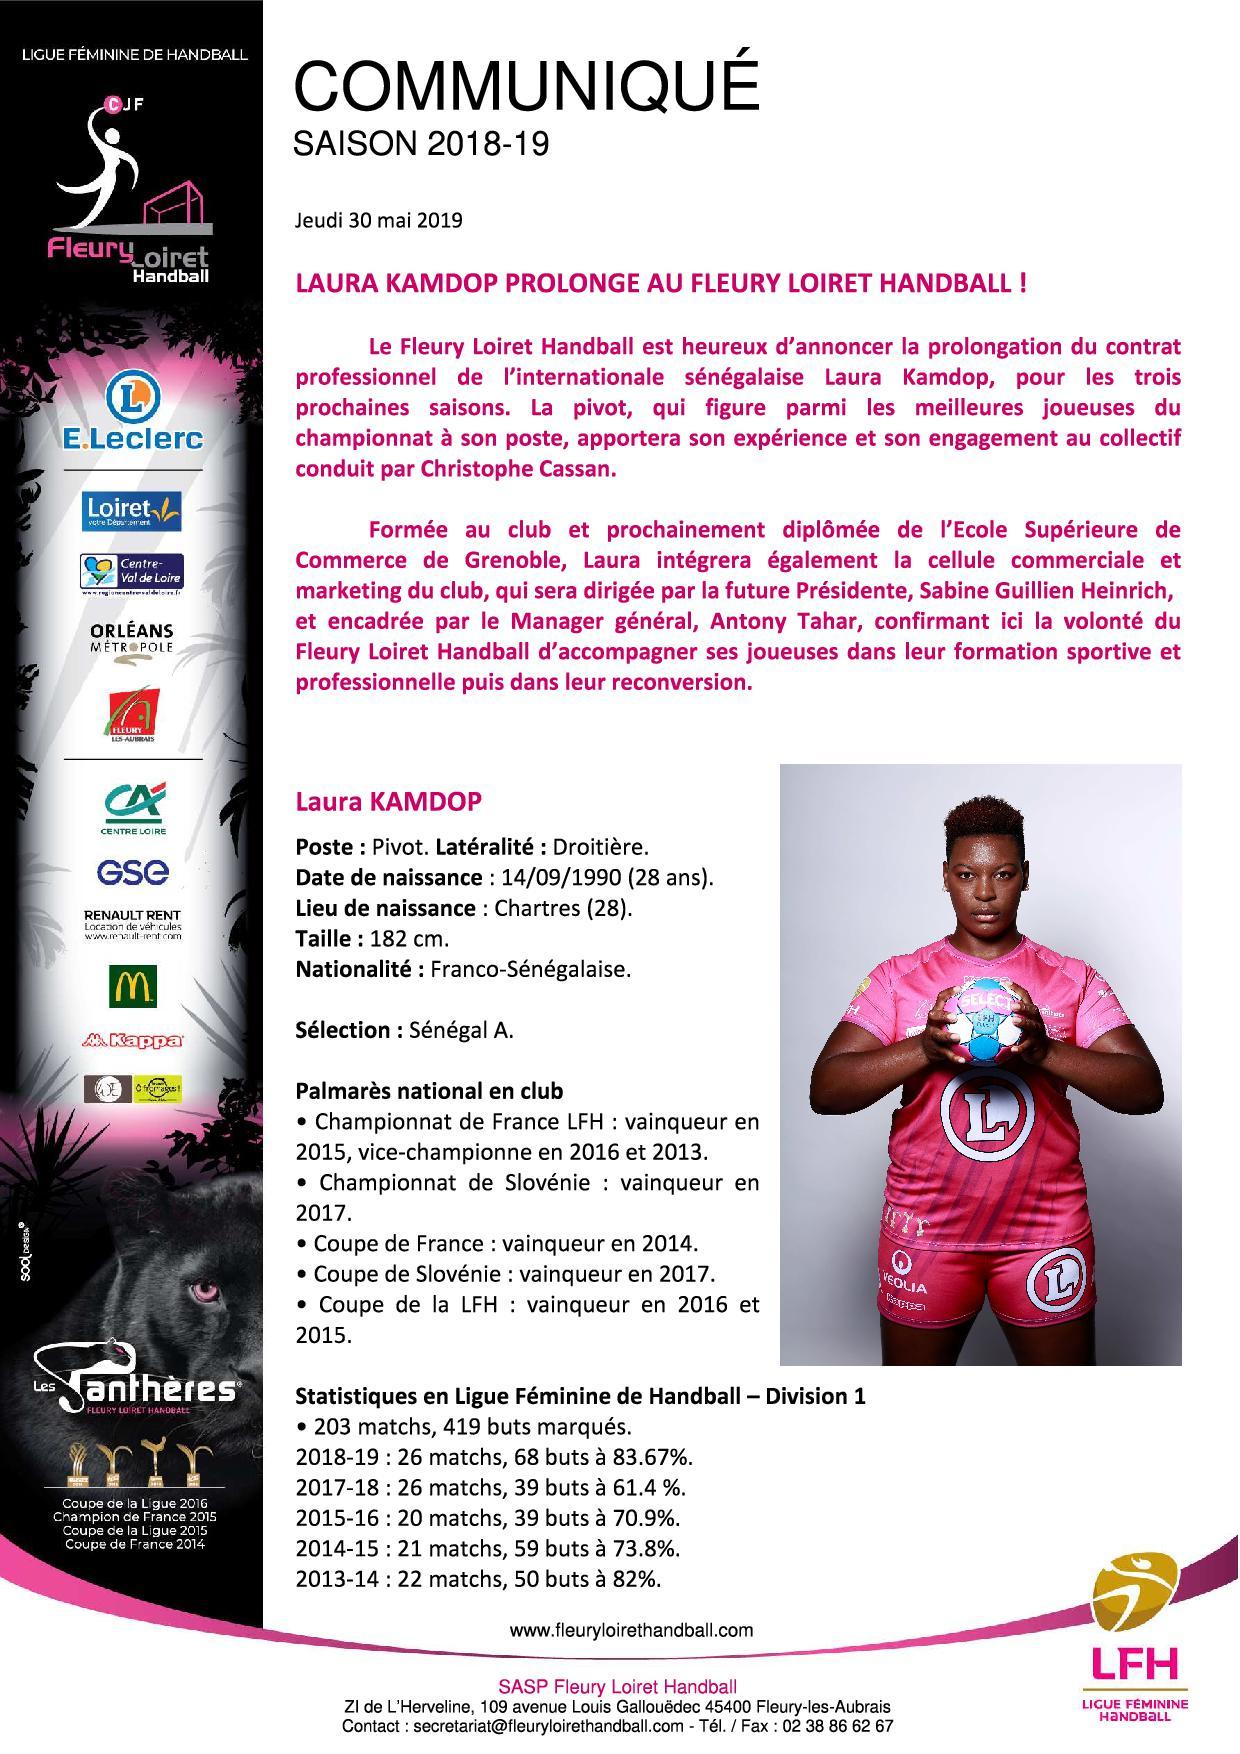 Communiqué Fleury Loiret Handball - Jeudi 30 mai 2019 - Communiqué Fleury Loiret Handball - Jeudi 30 mai 20191.jpg